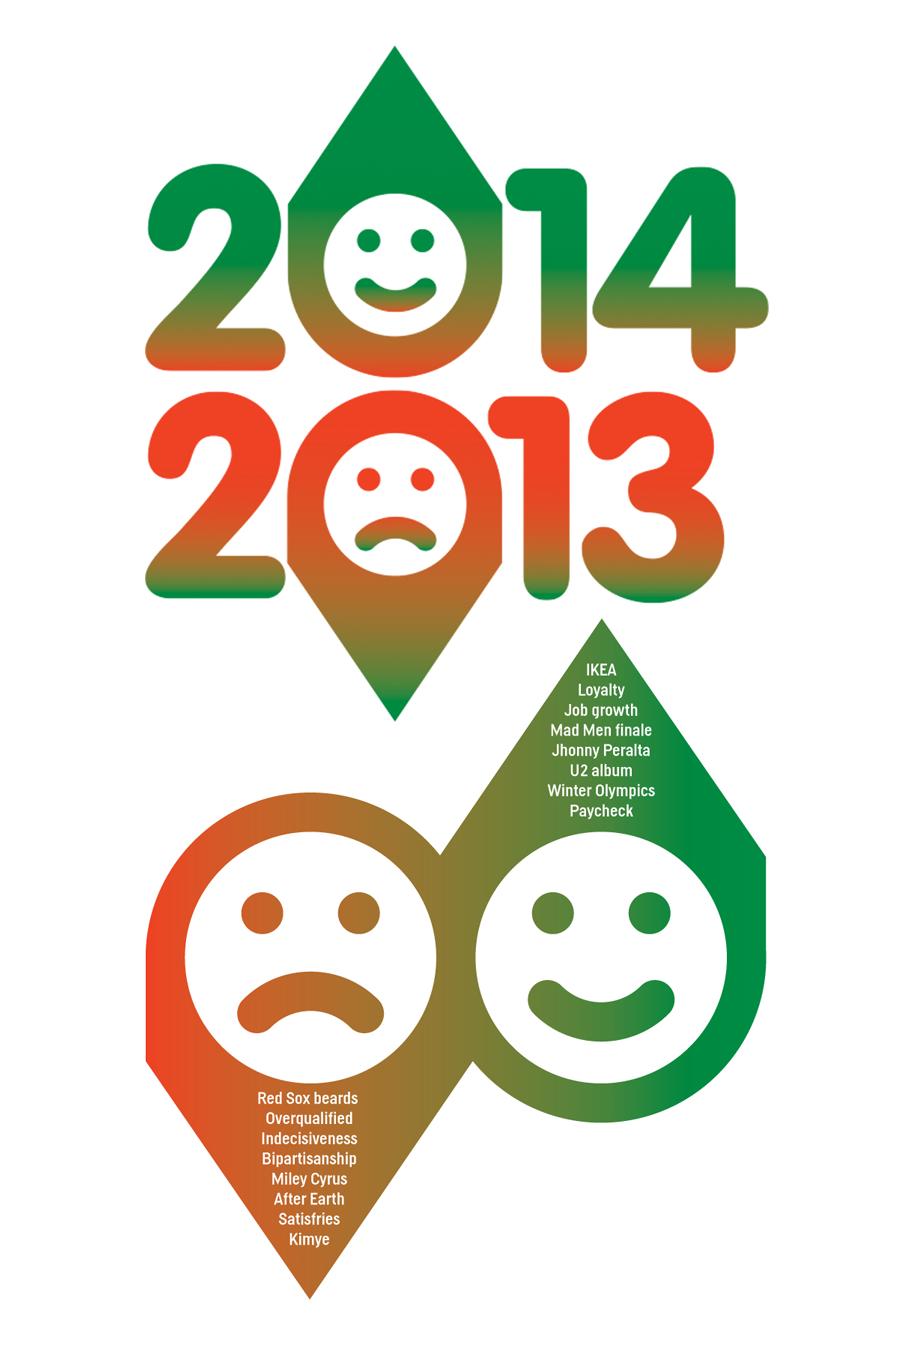 Outlook on 2013 vs. 2014 for myself, STL and beyond.